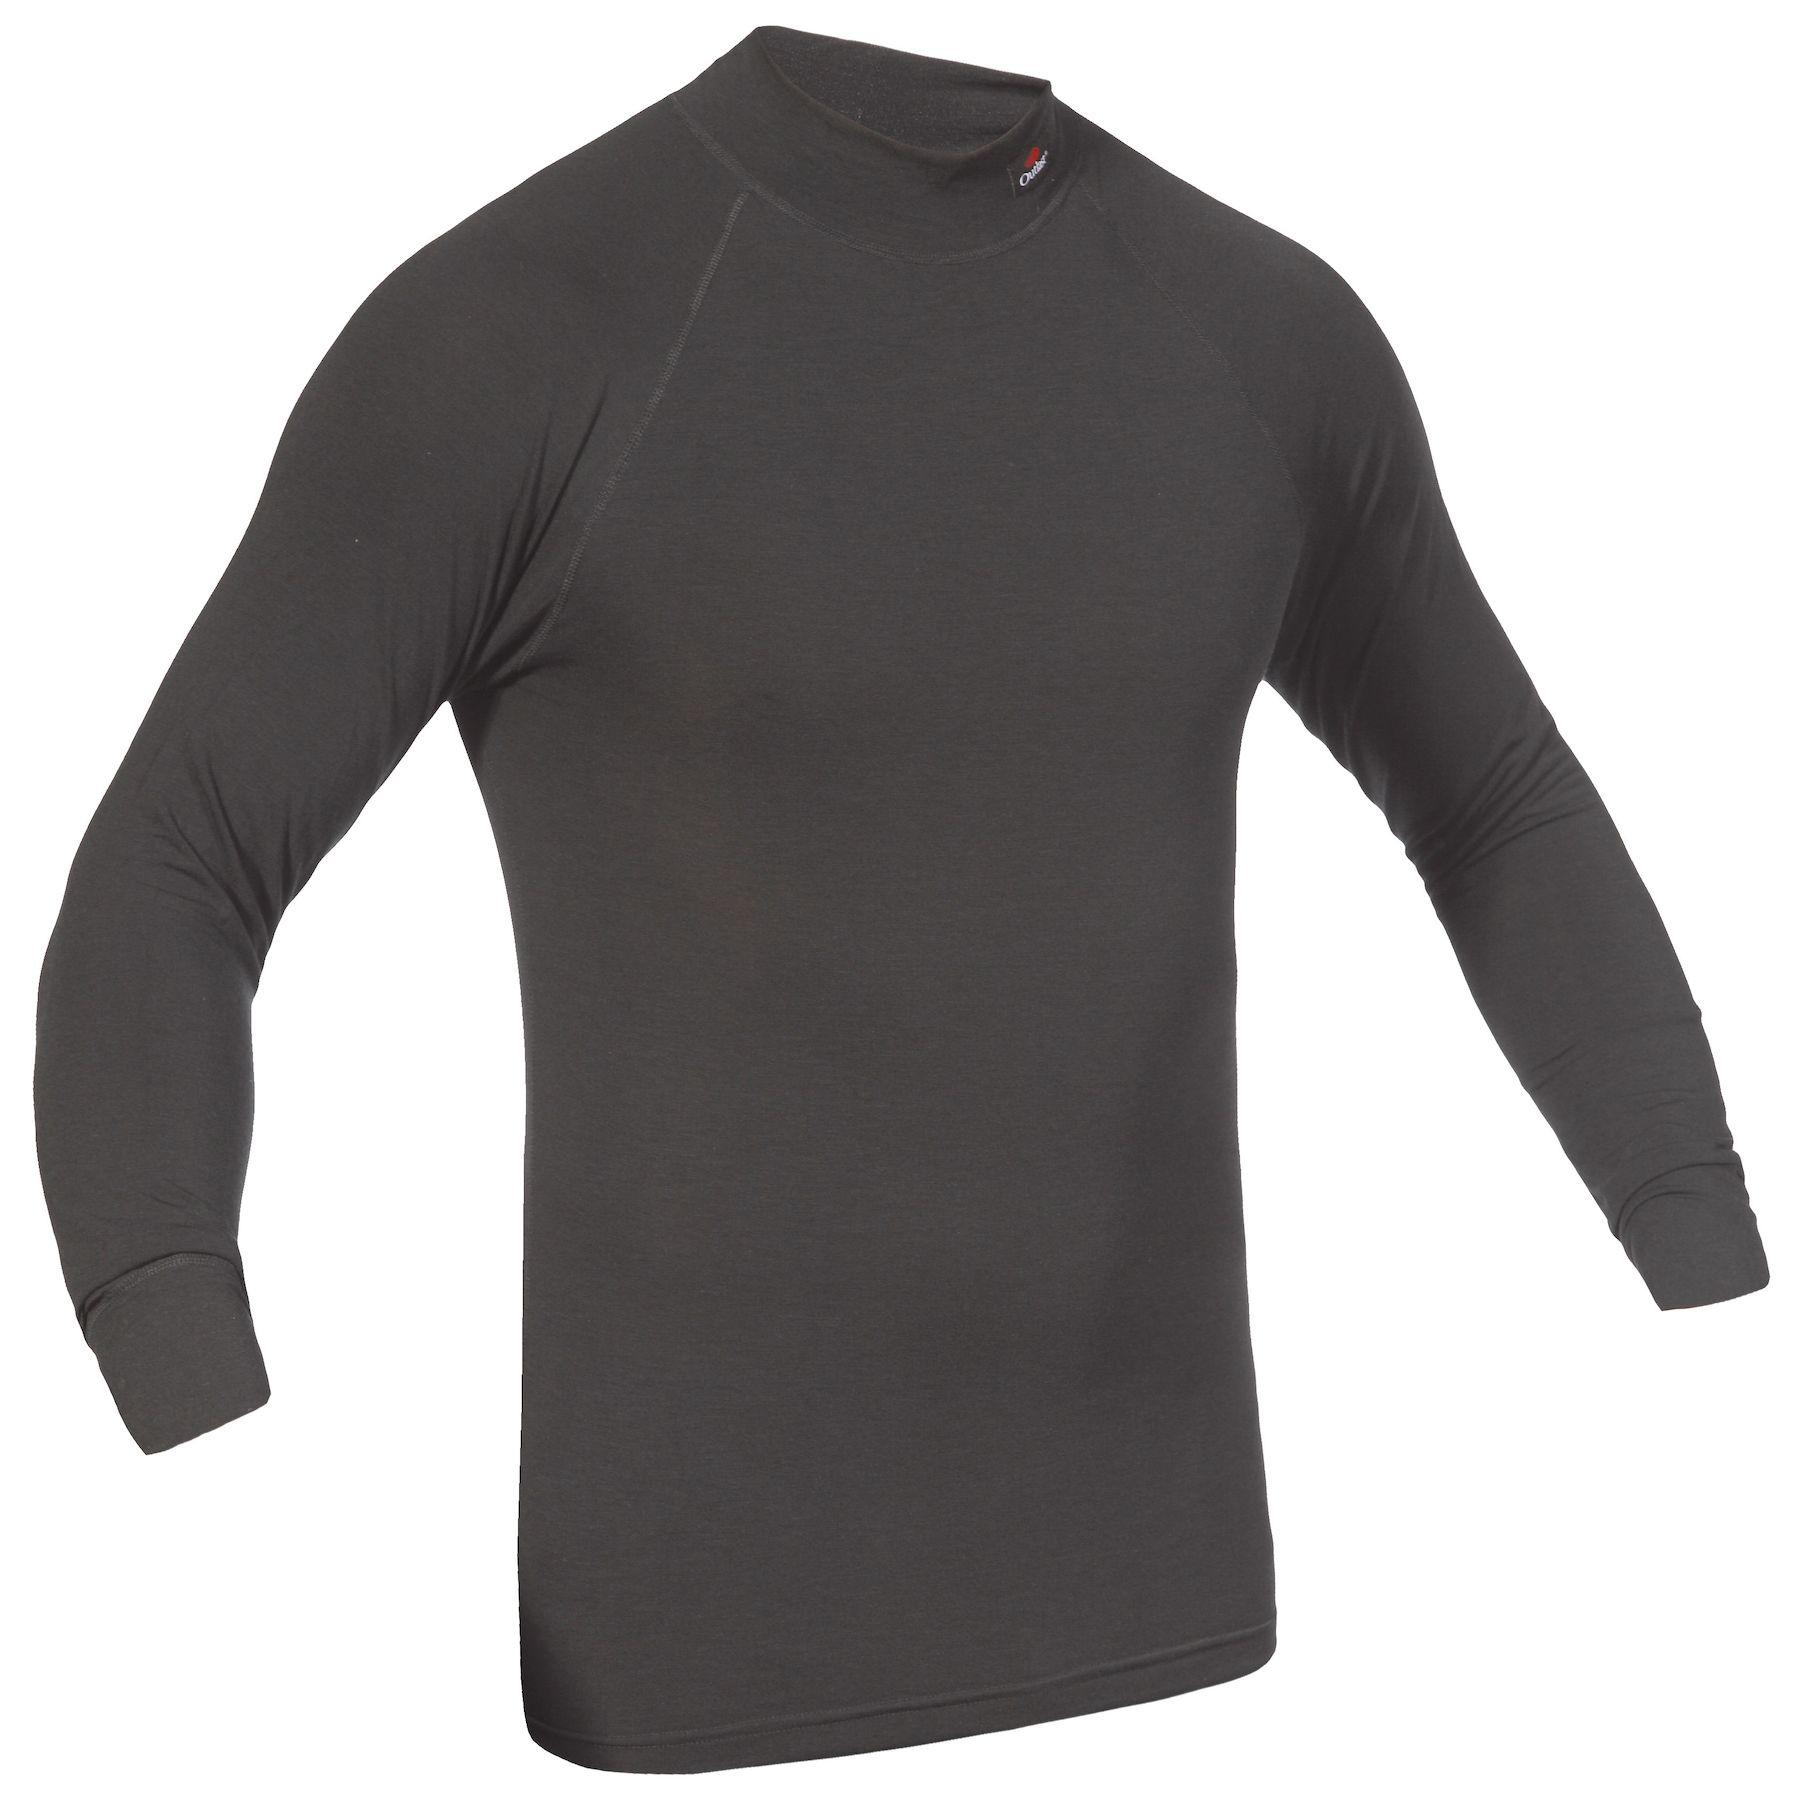 New 2019 Winter Thermal Fleece cycling Jerseys bike shirt bib Long pants set A45